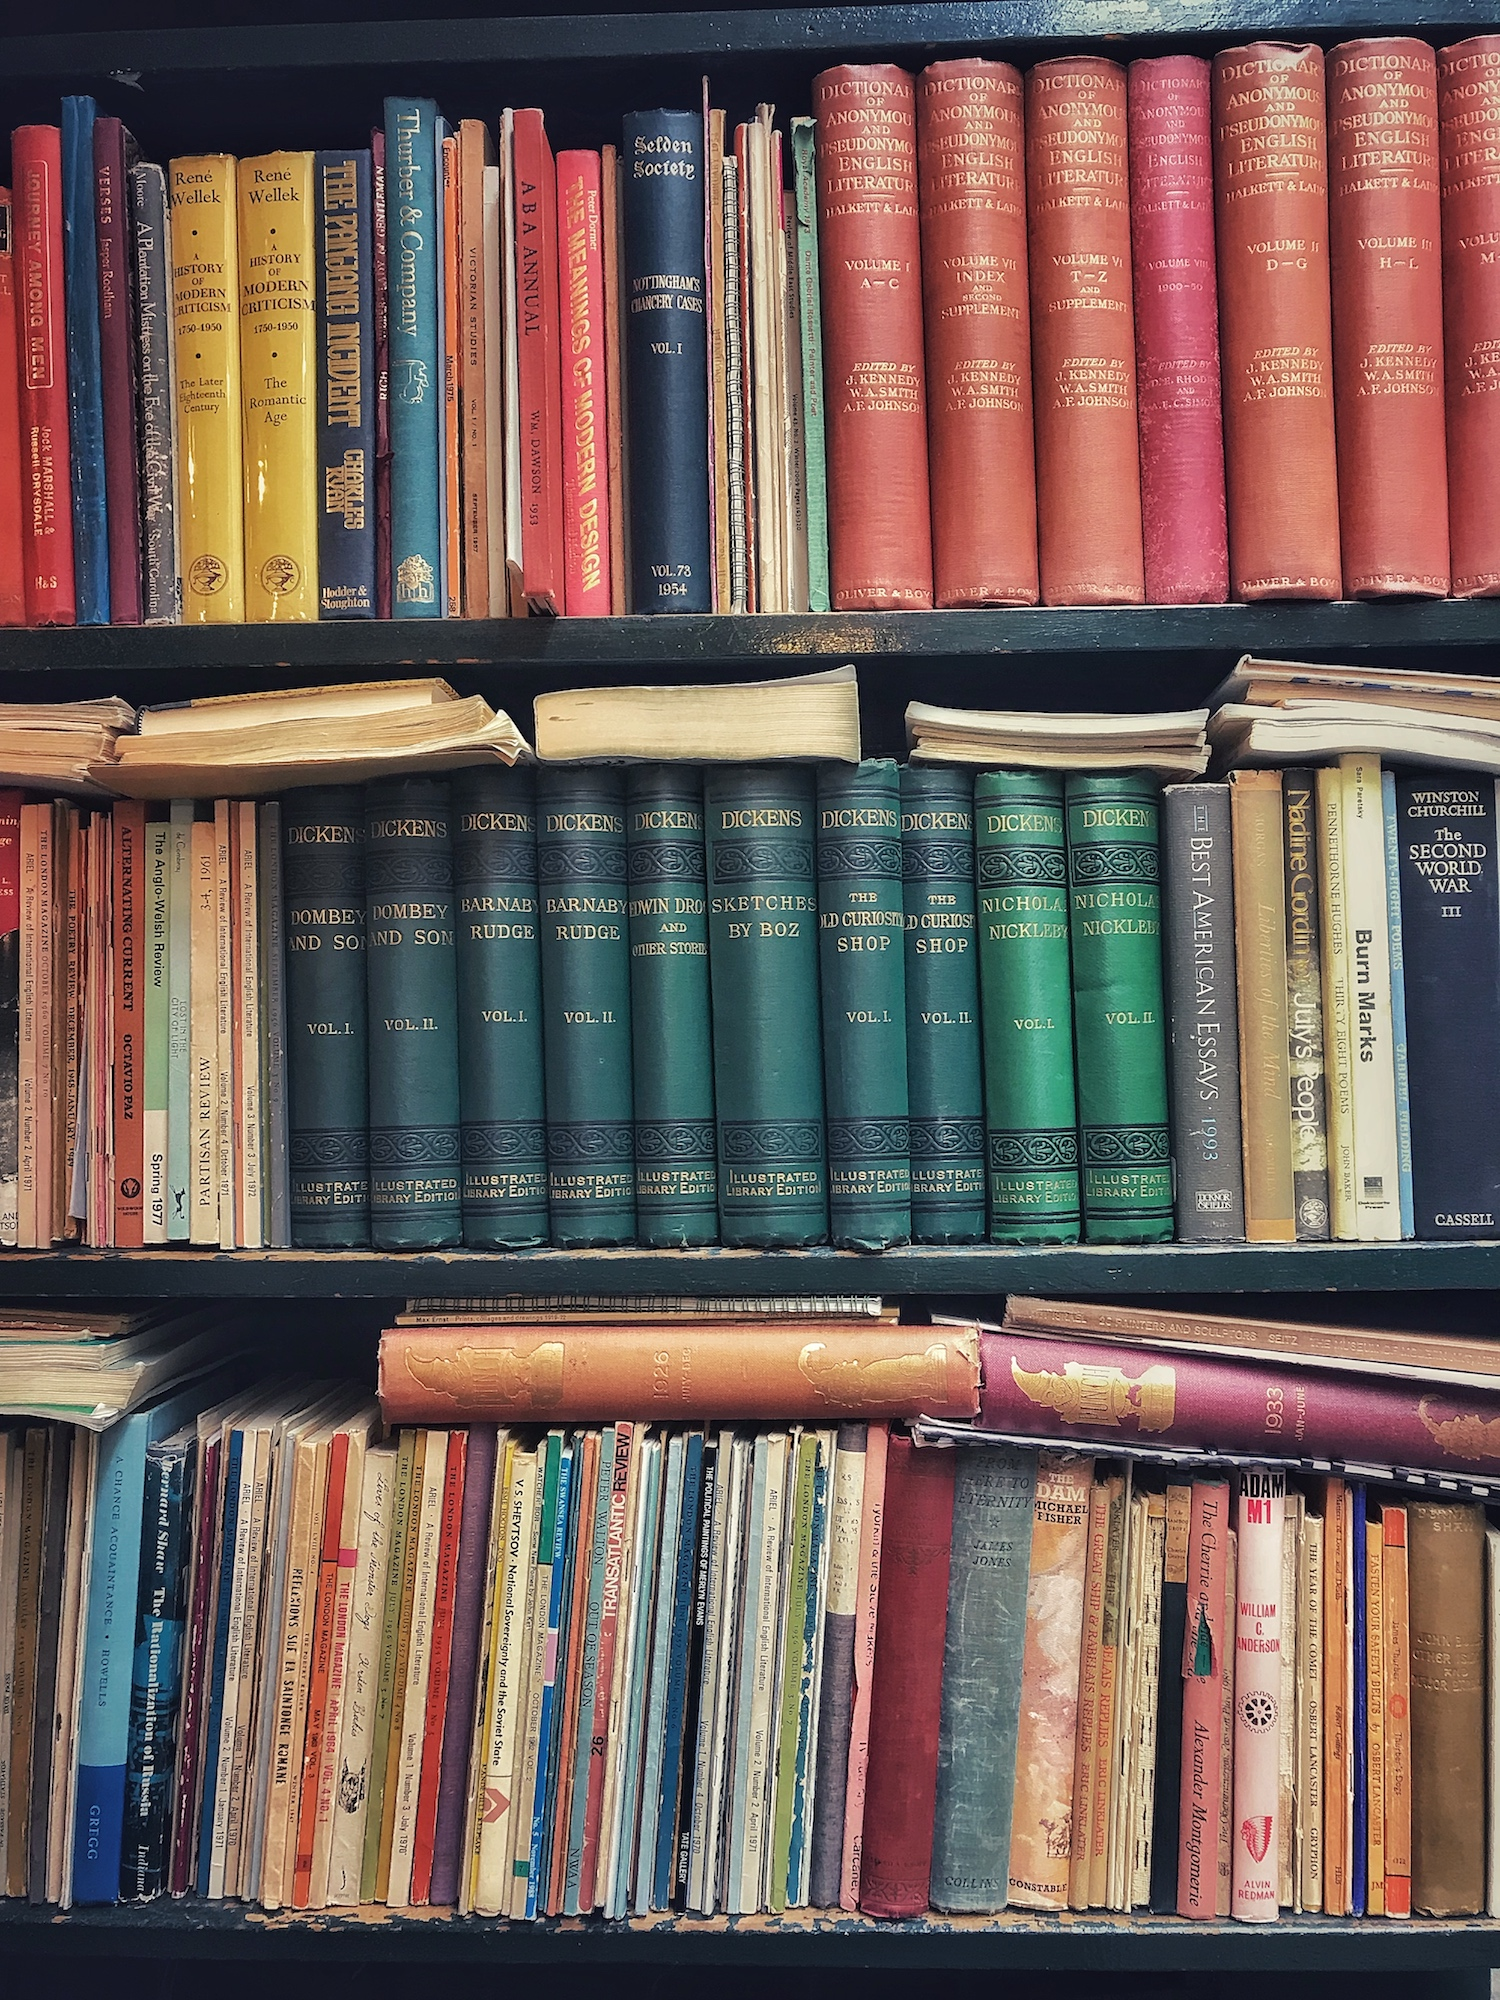 Old Books of Shelf.